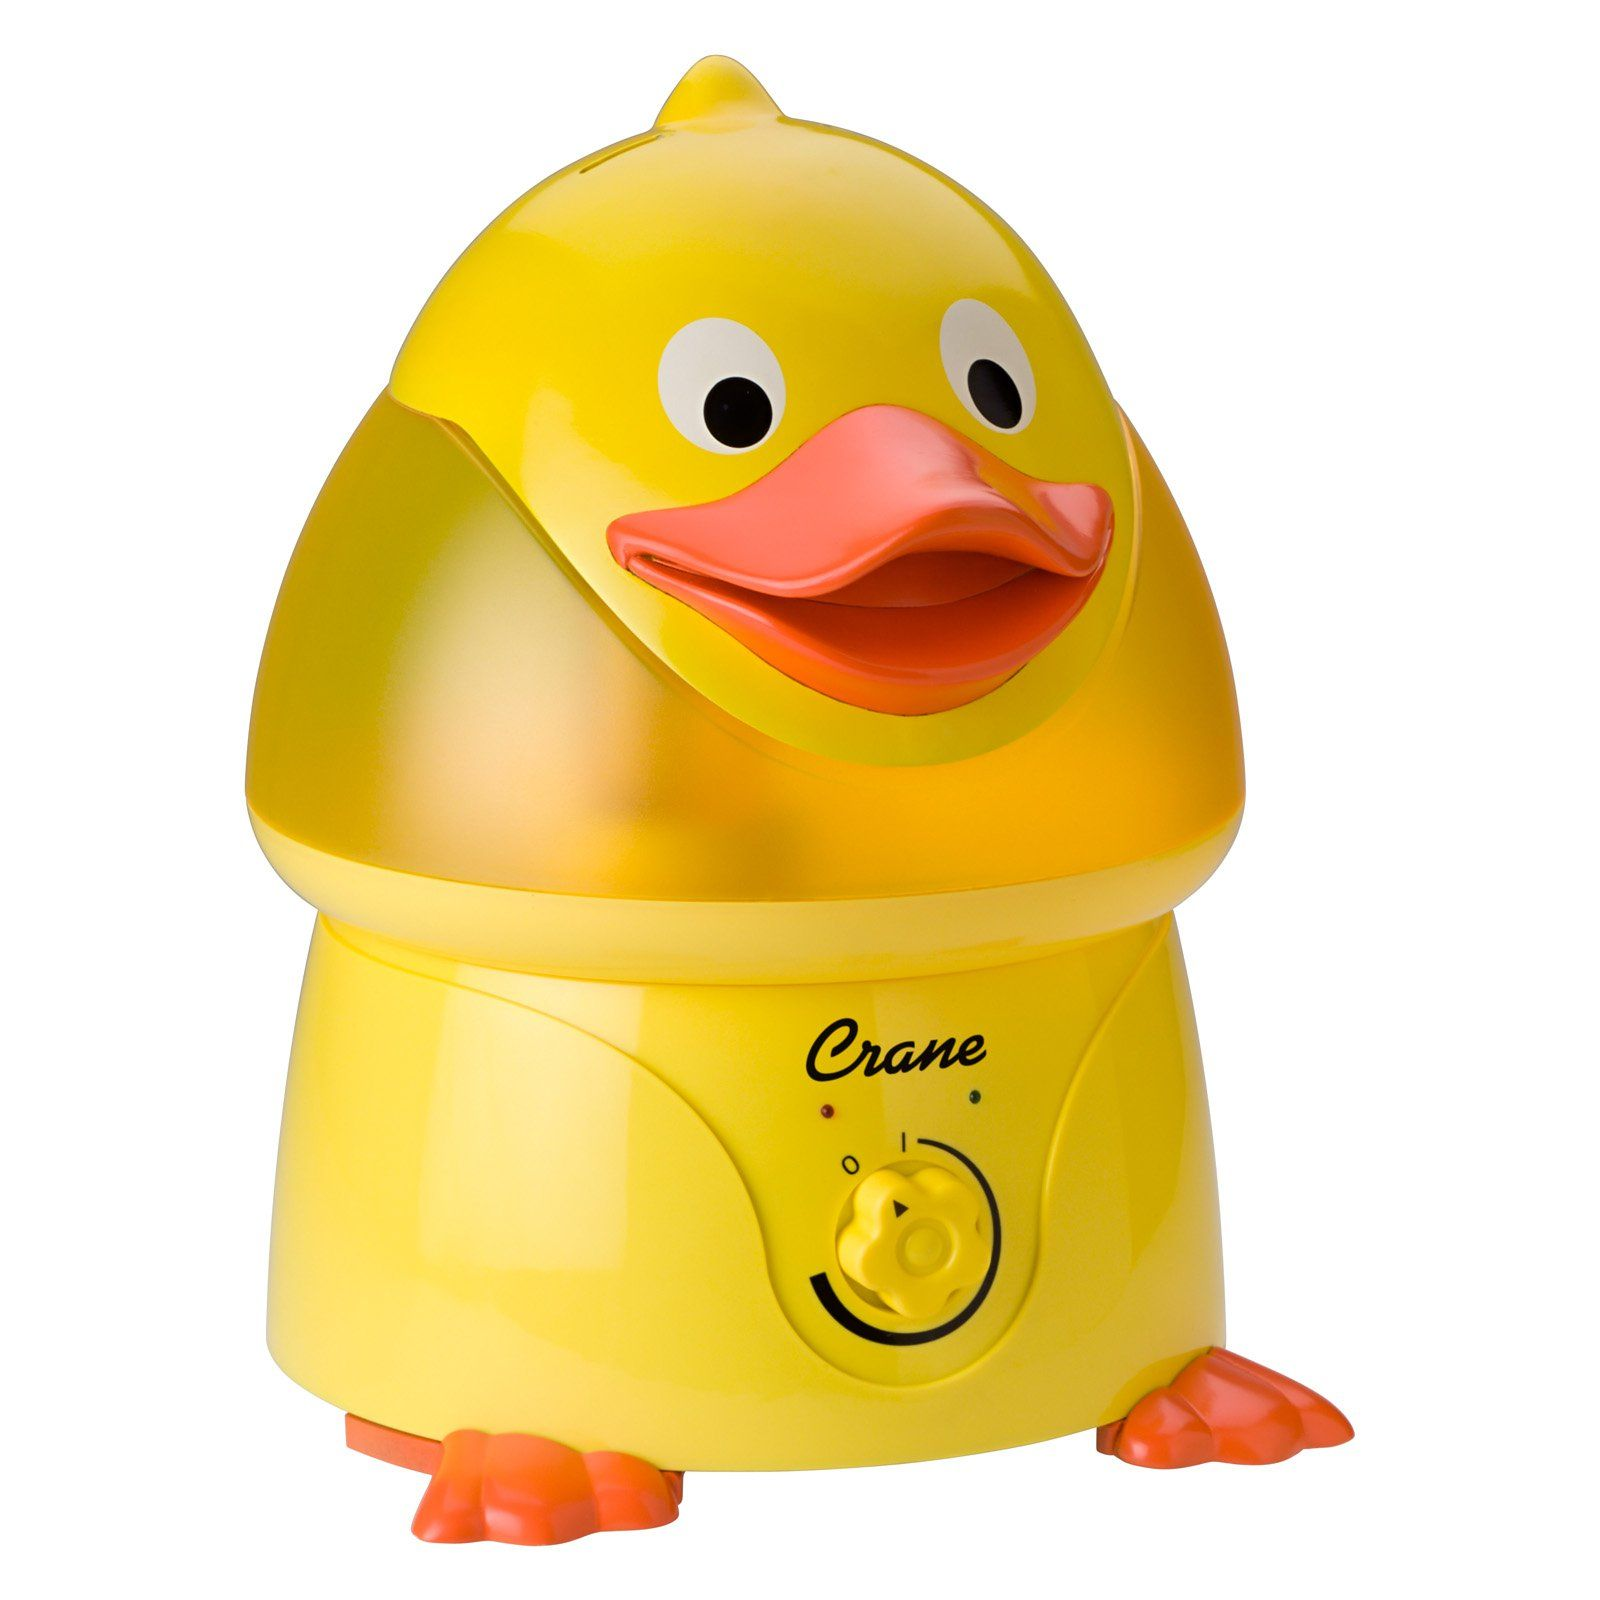 Crane Adorable Duck Ultrasonic Cool Mist Humidifier 1gal